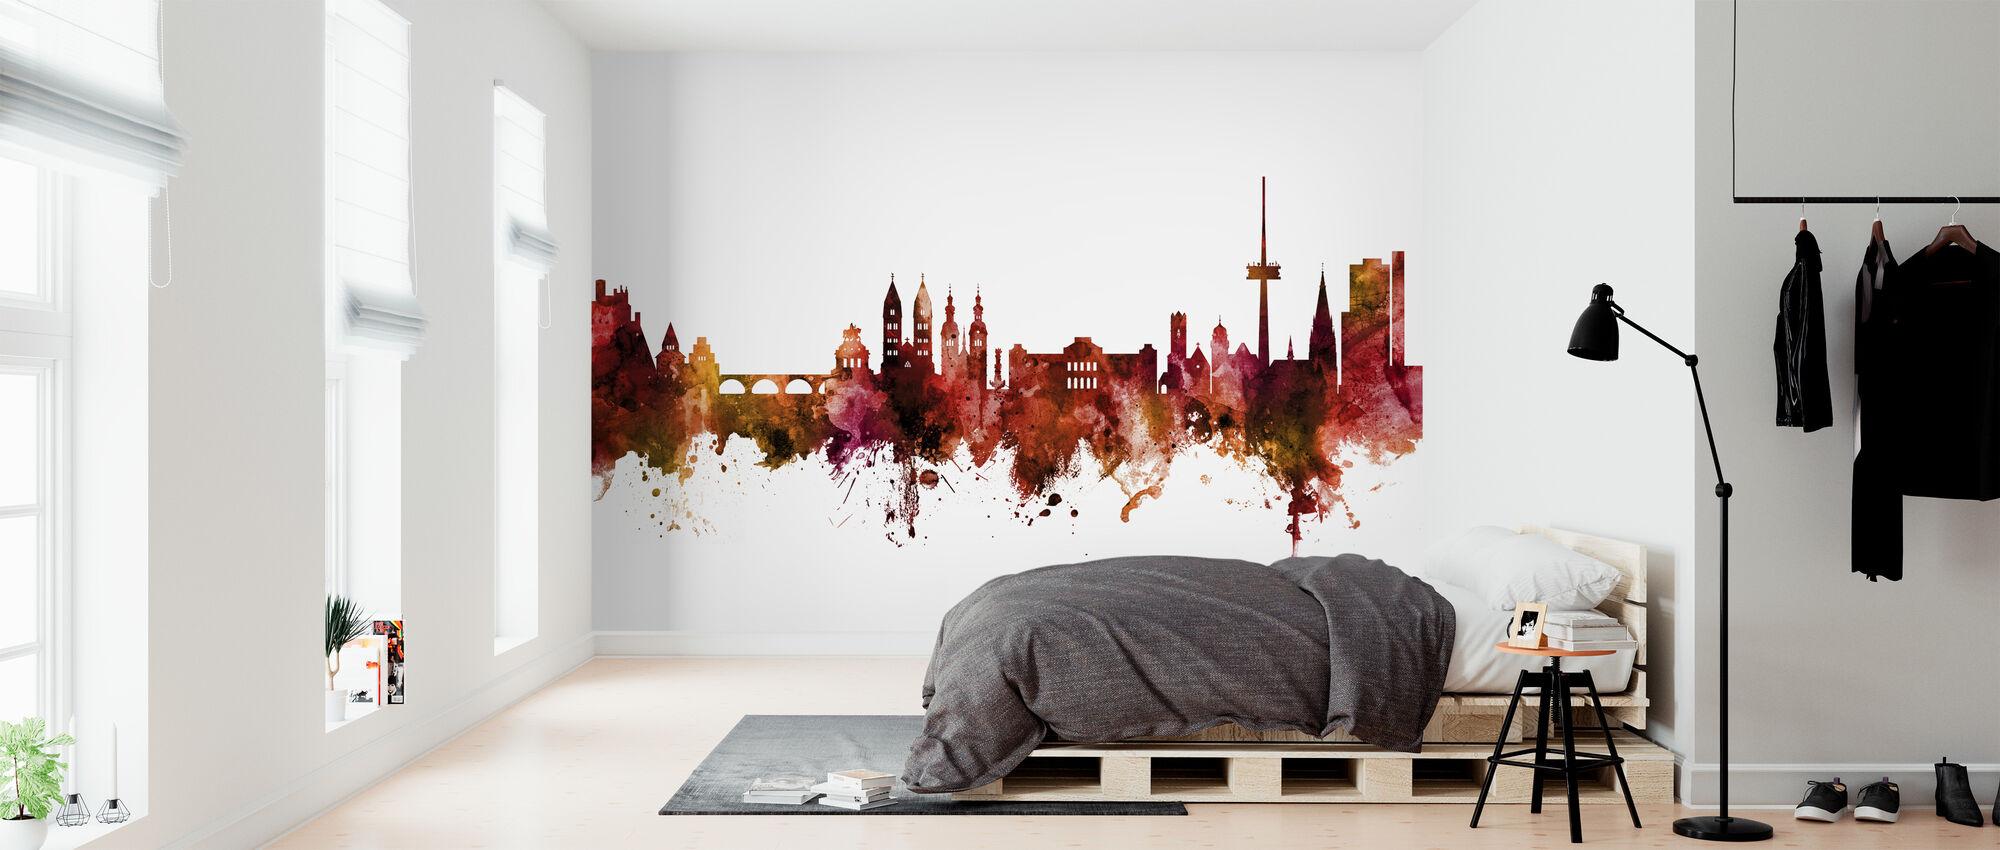 Koblenz Germany Skyline - Wallpaper - Bedroom